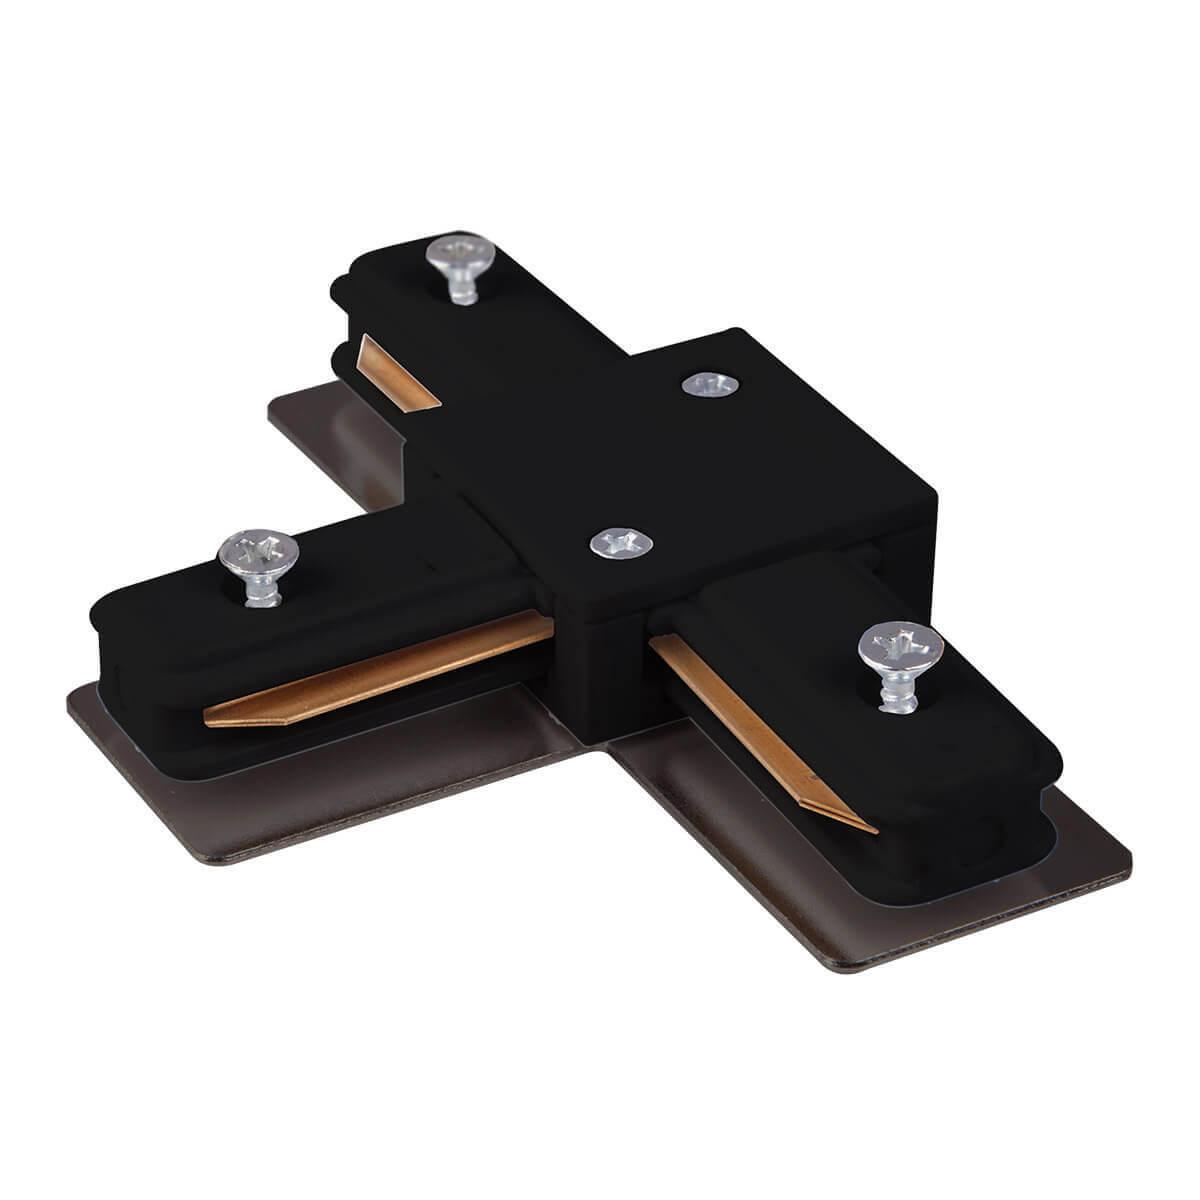 Коннектор Elektrostandard 4690389112362 TRL-1-1 (для однофазного шинопровода) шинопровод elektrostandard 4690389134302 trl 1 1